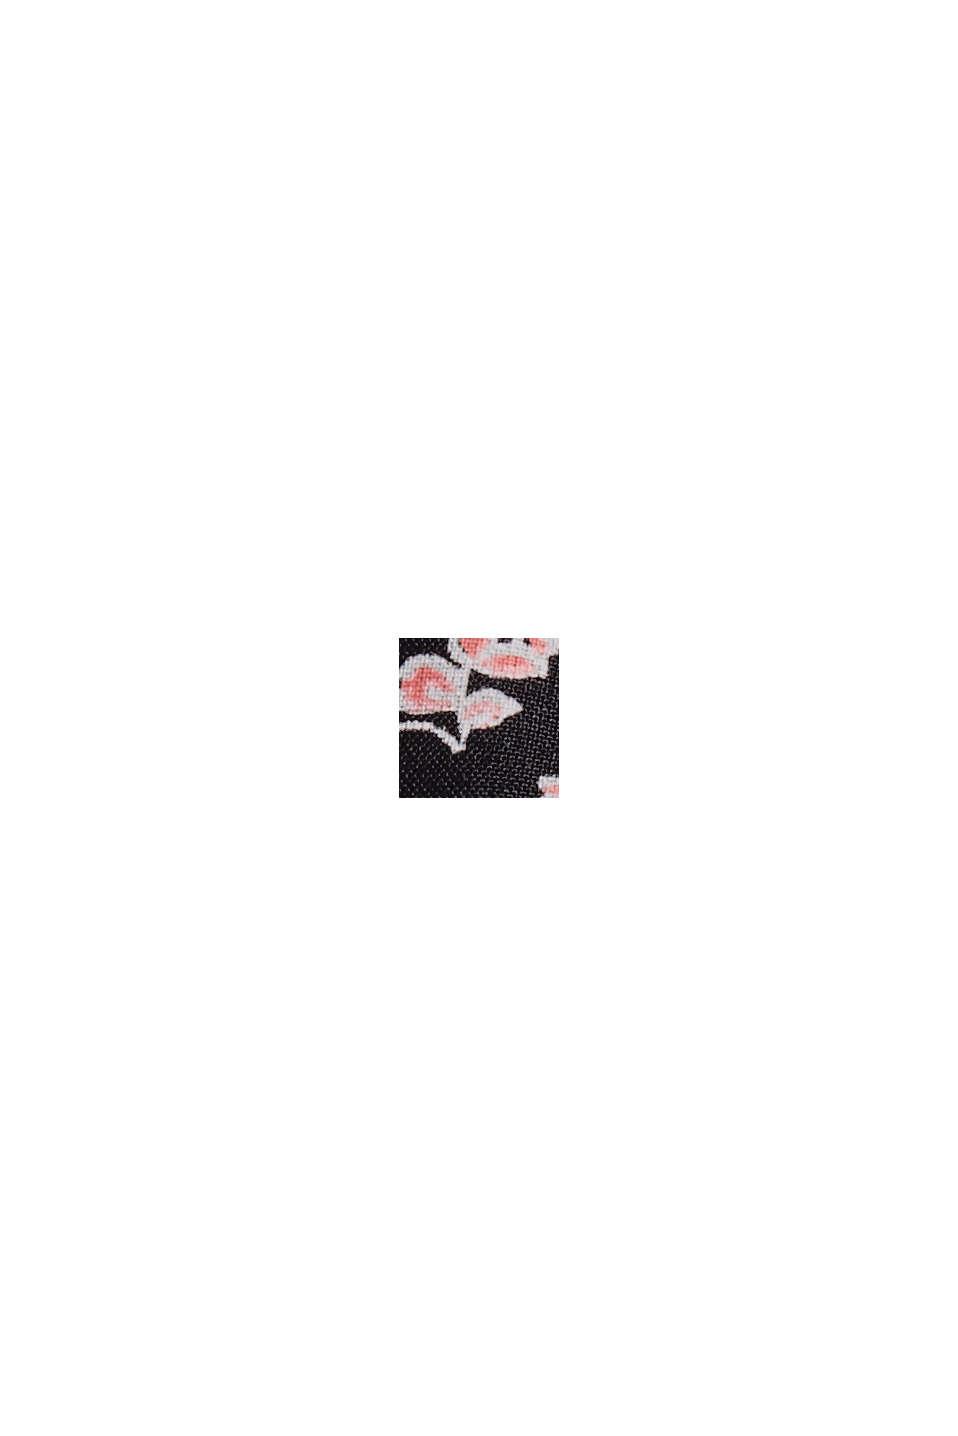 Blouse van 100% LENZING™ ECOVERO™, NEW BLACK, swatch